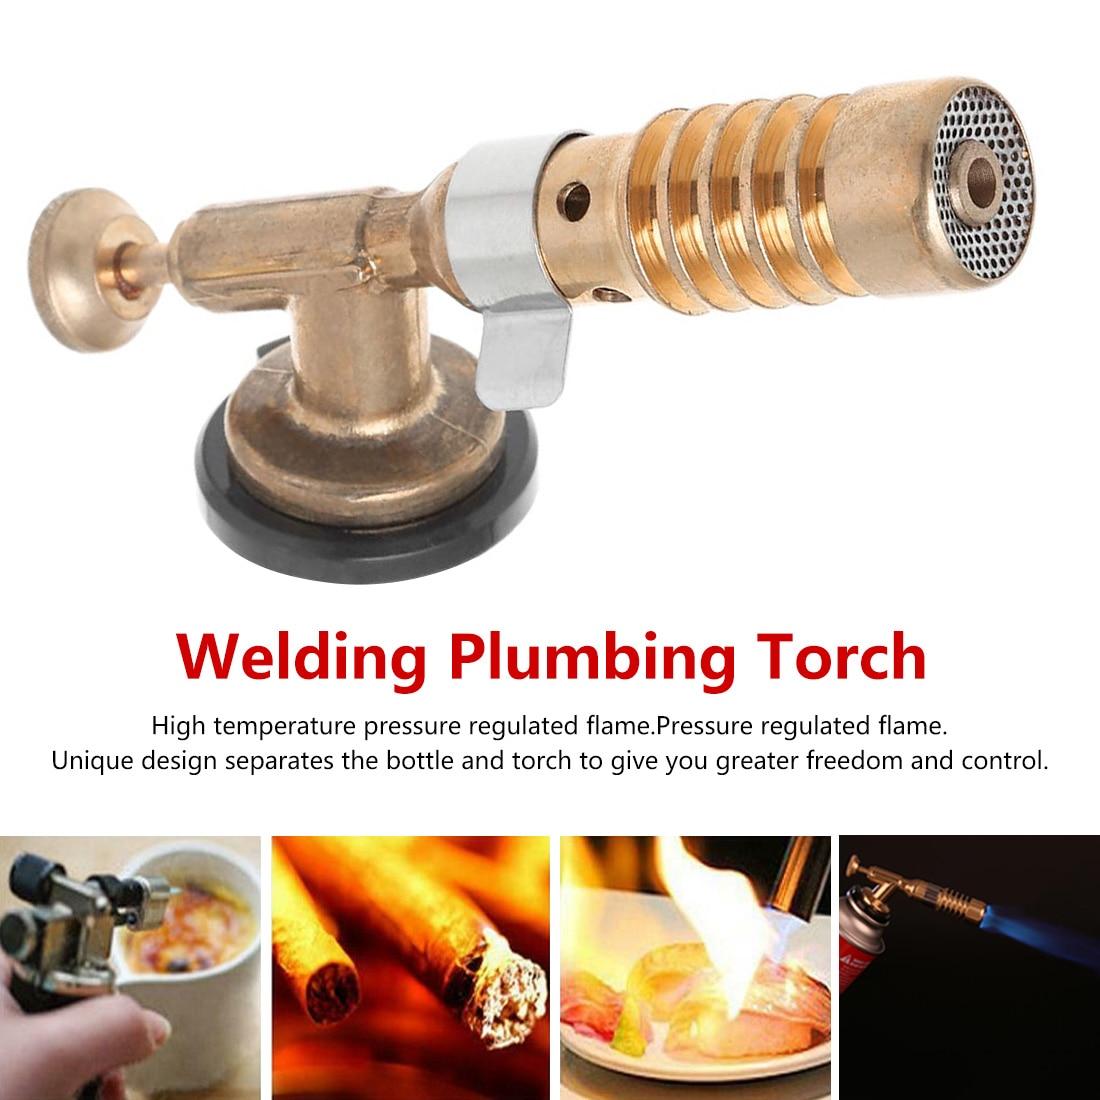 Portable Gas Torch Flame Gun Blowtorch Copper Flame Butane Gas-Burner Lighter Heating Welding For Outdoor Camping Spray Gun